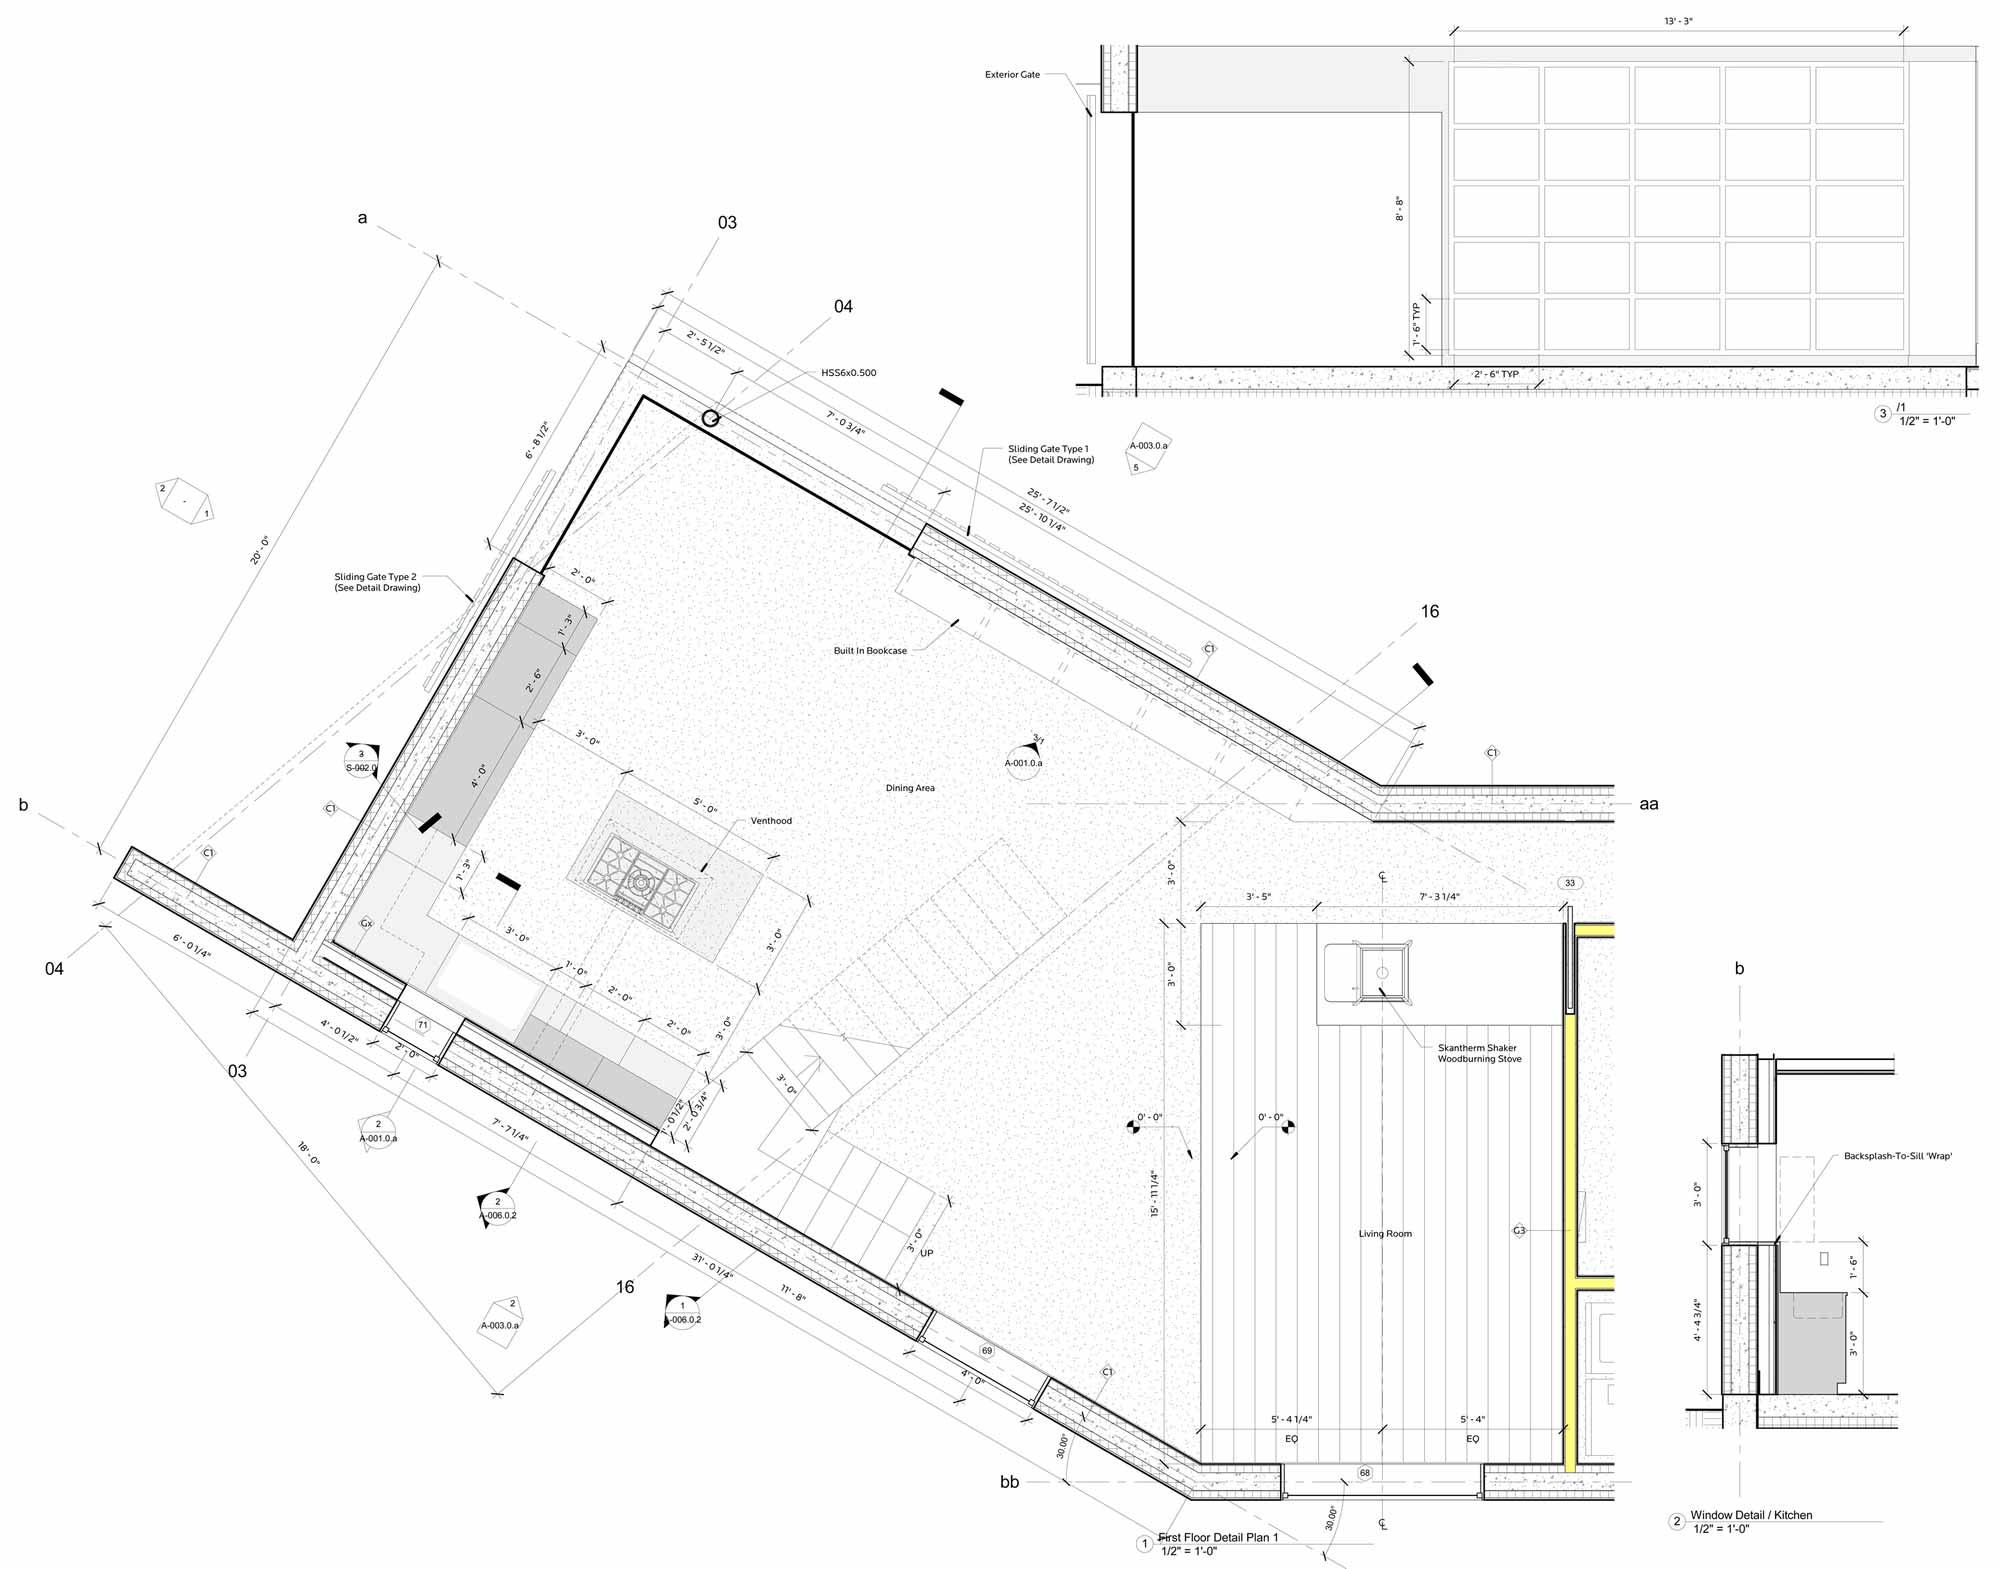 First Floor Plan, Dutchess House No. 1, New York by Grzywinski+Pons